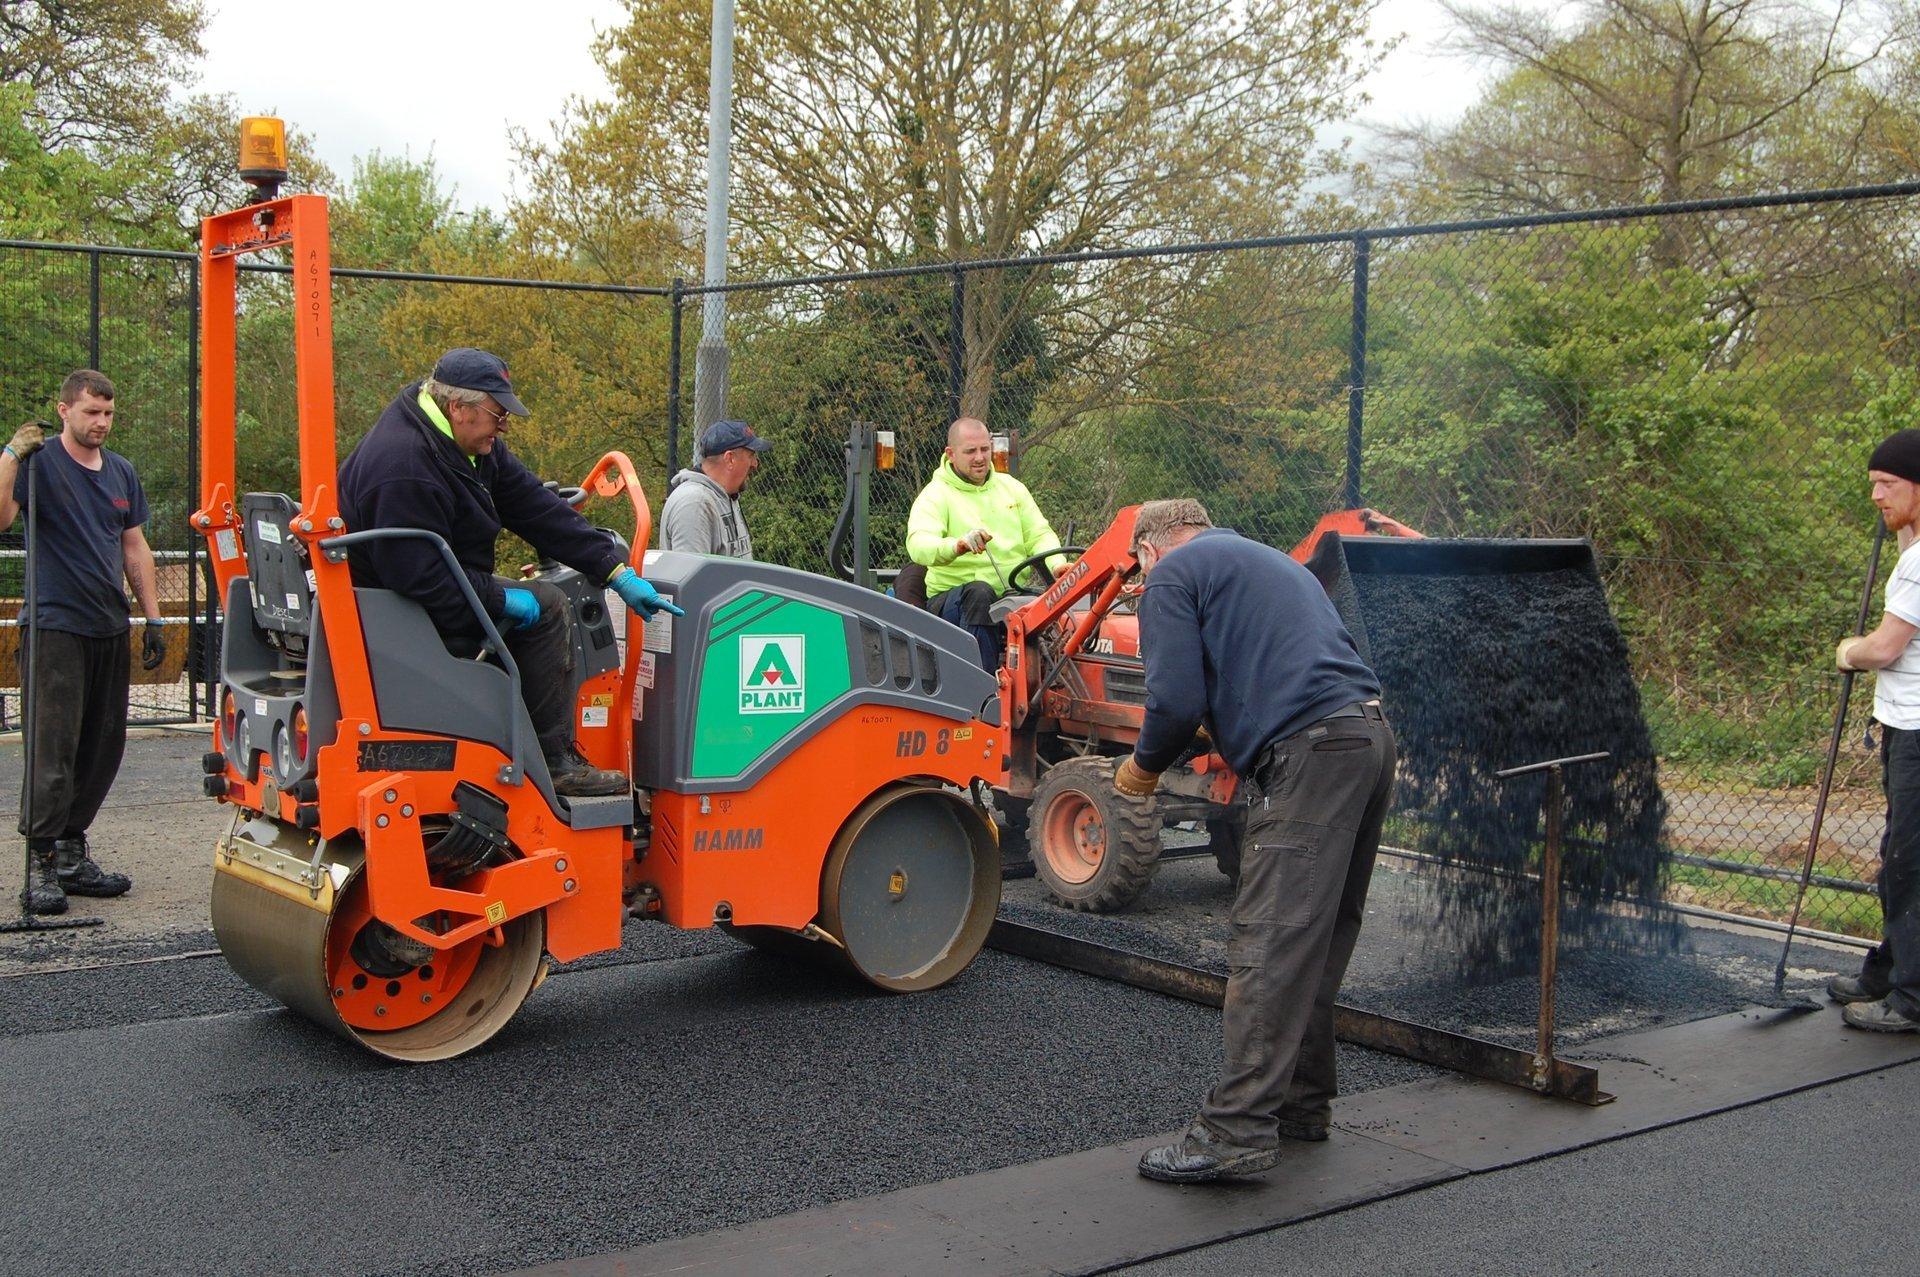 asphalt laying